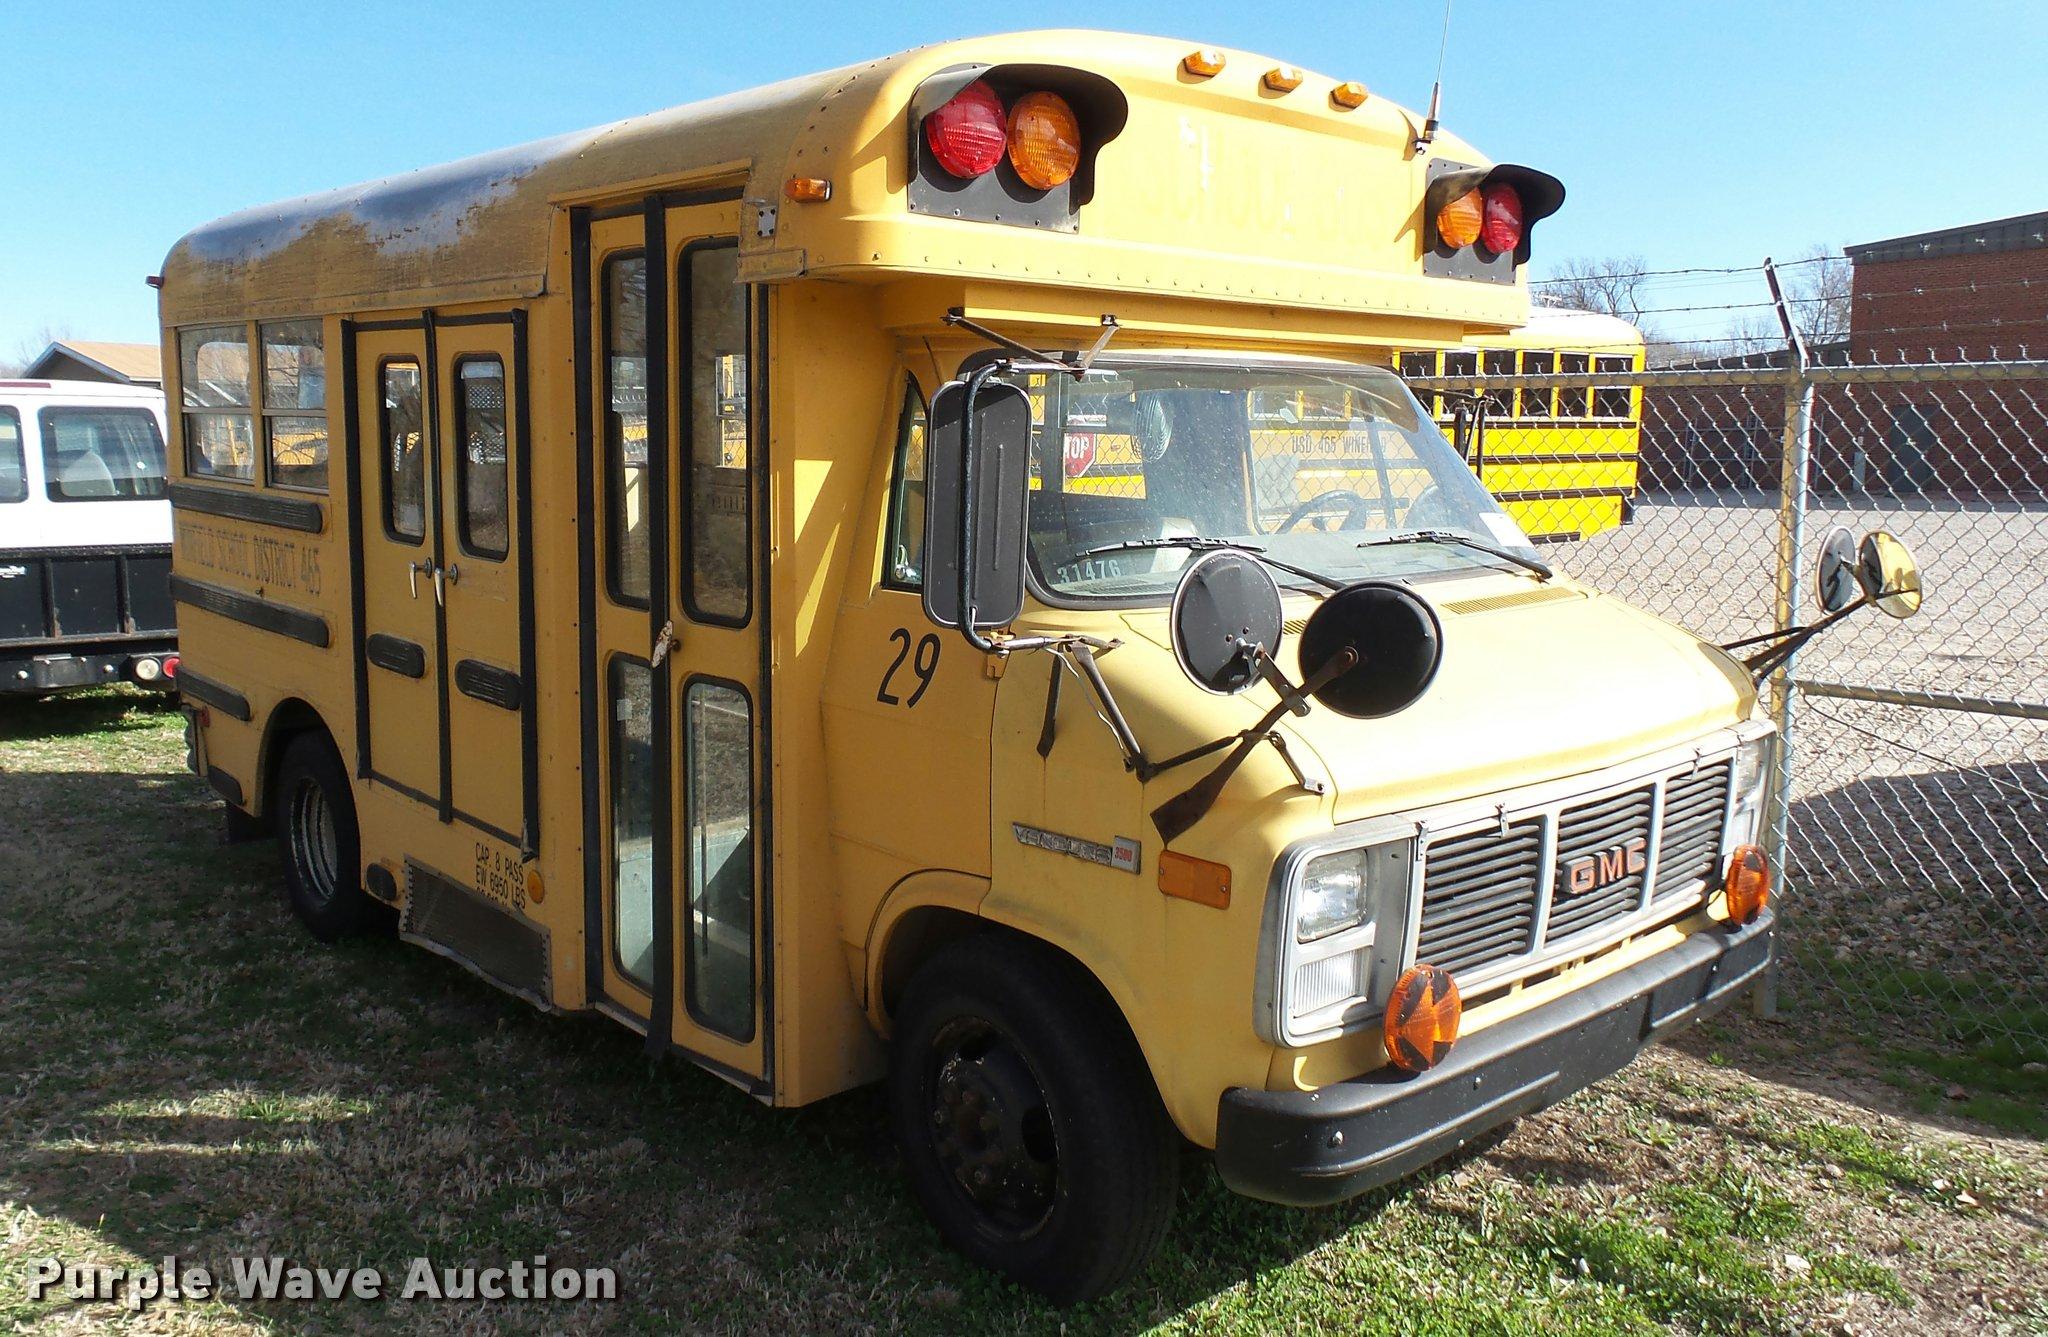 1989 GMC Vandura G3500 school bus | Item DA0419 | SOLD! Apri